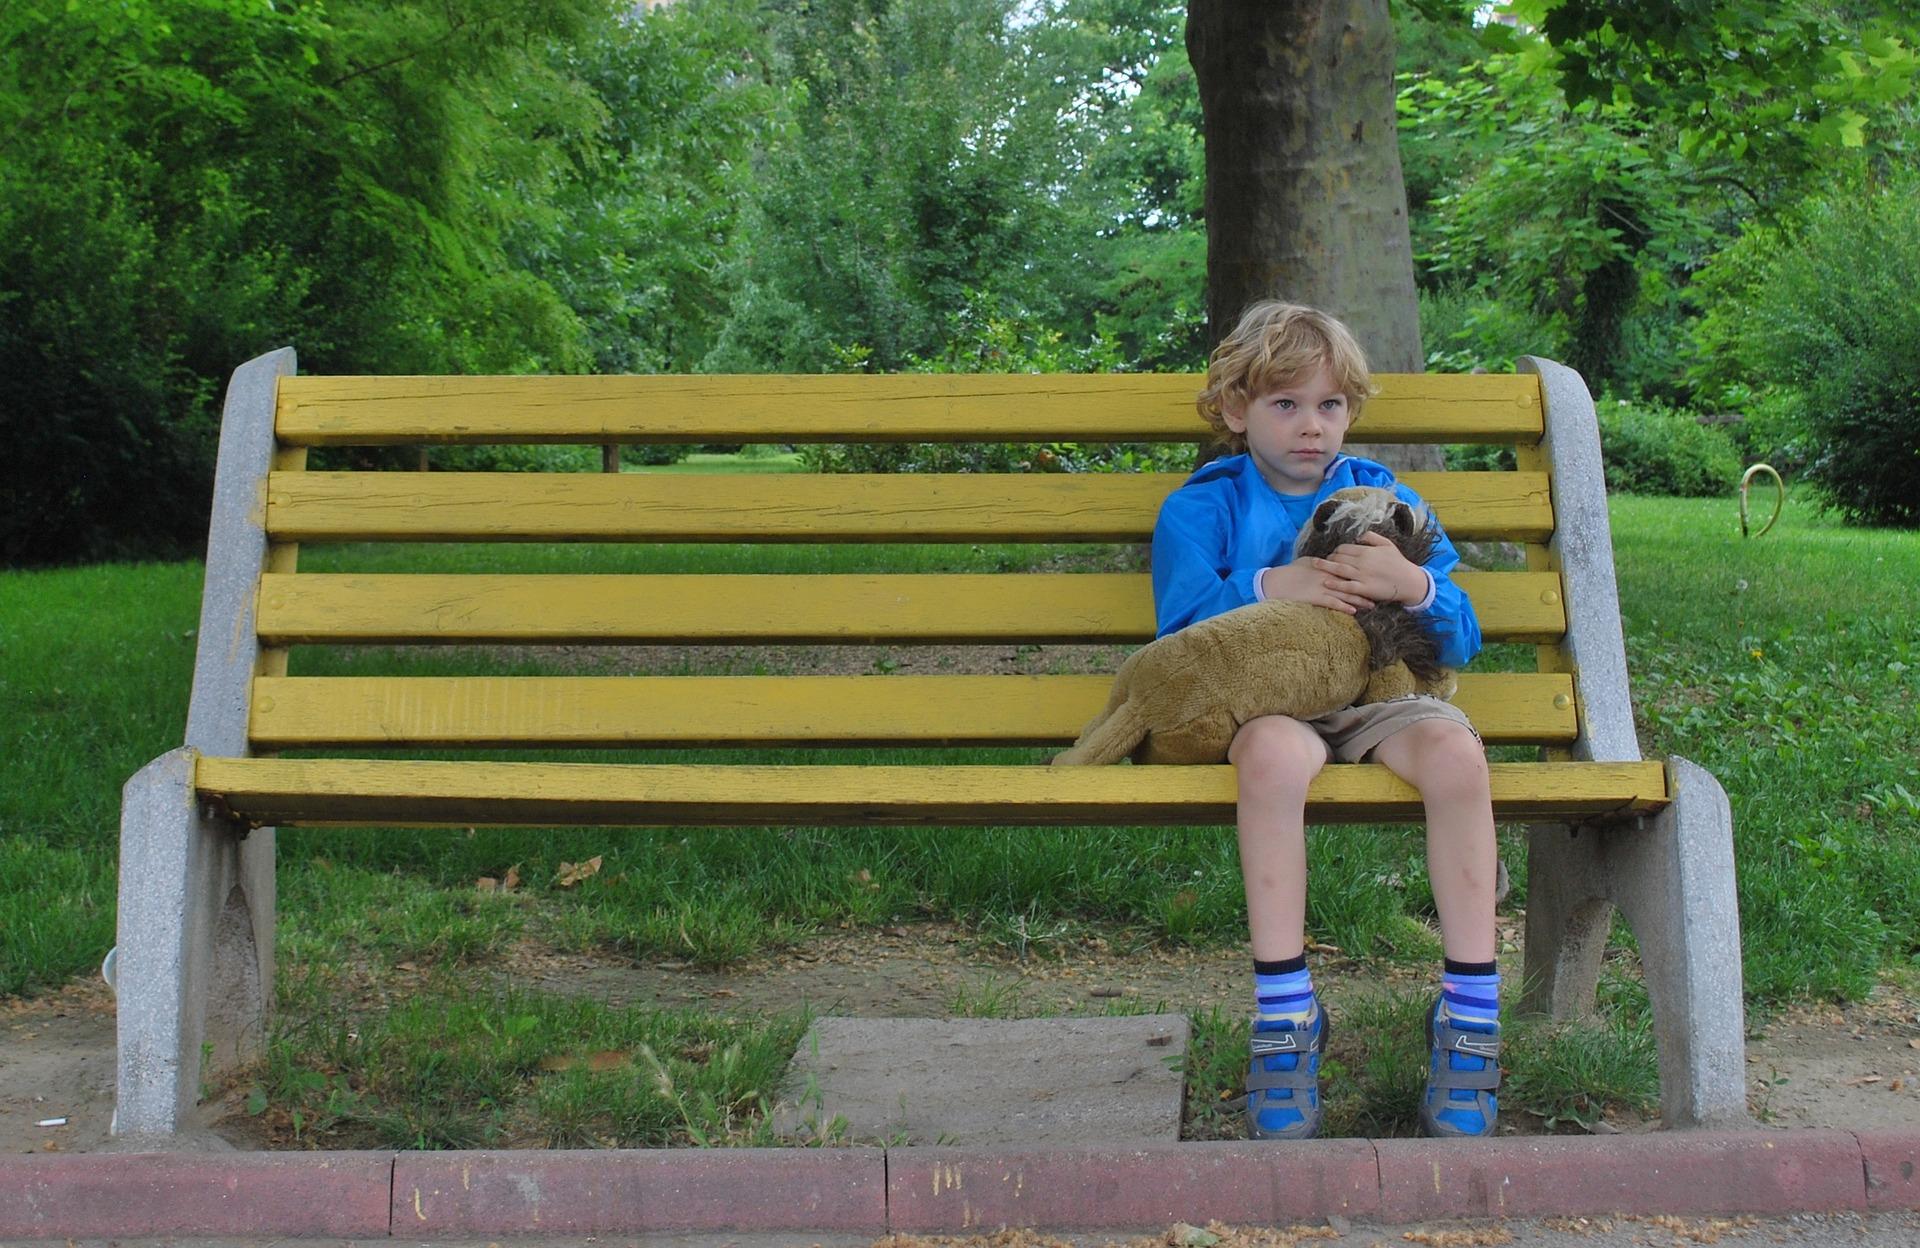 Informes periciales psicològics  àmbit de família